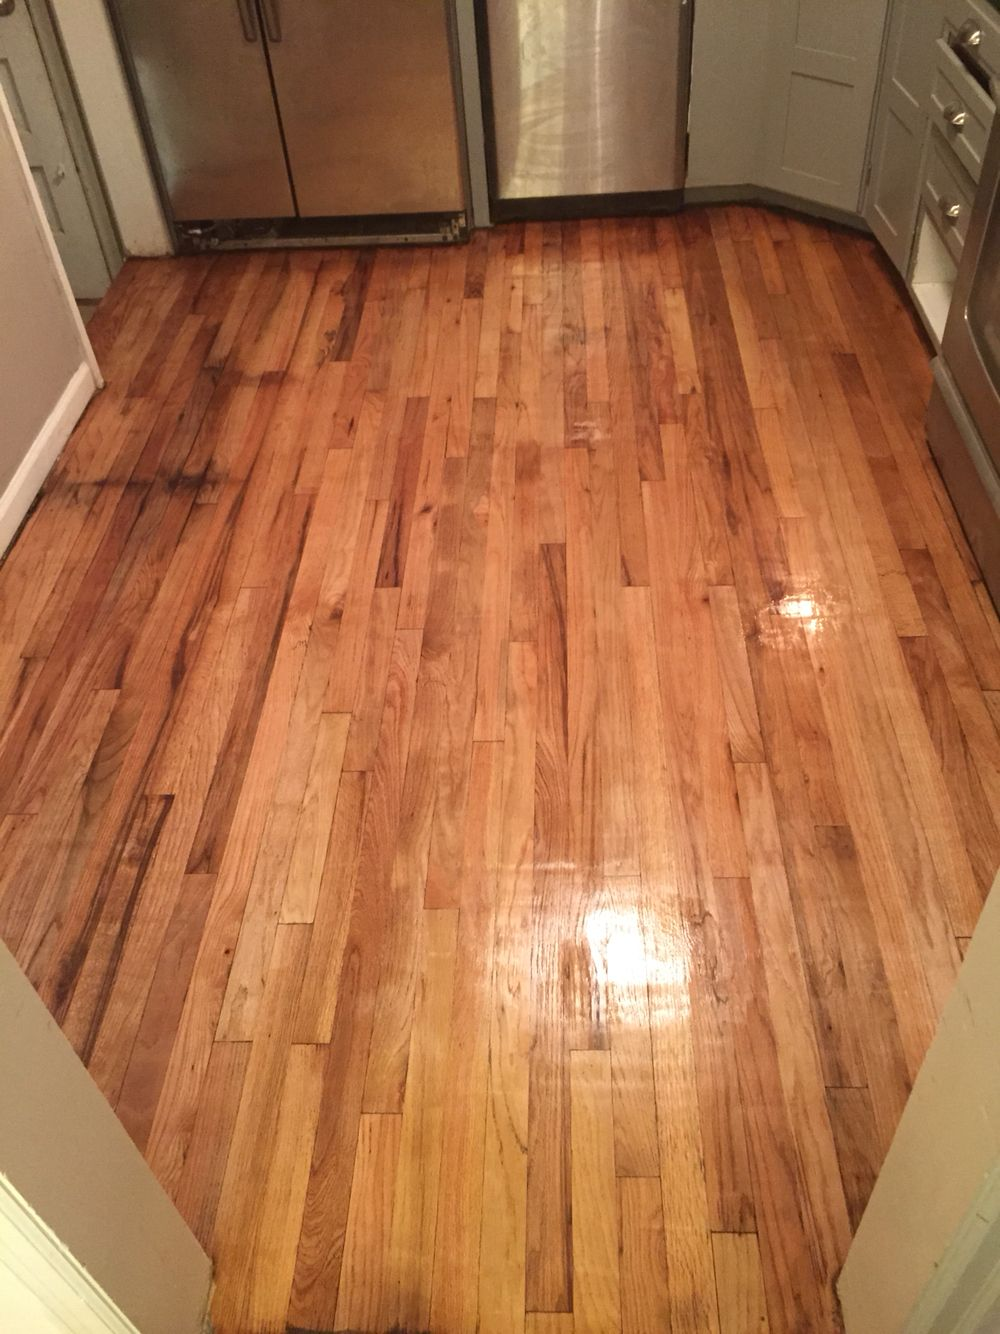 Refinished Red Oak Hard Wood Floors Found Under Vinyl Flooring In Our 1940 S Home Hardwood Floors Best Flooring White Oak Floors